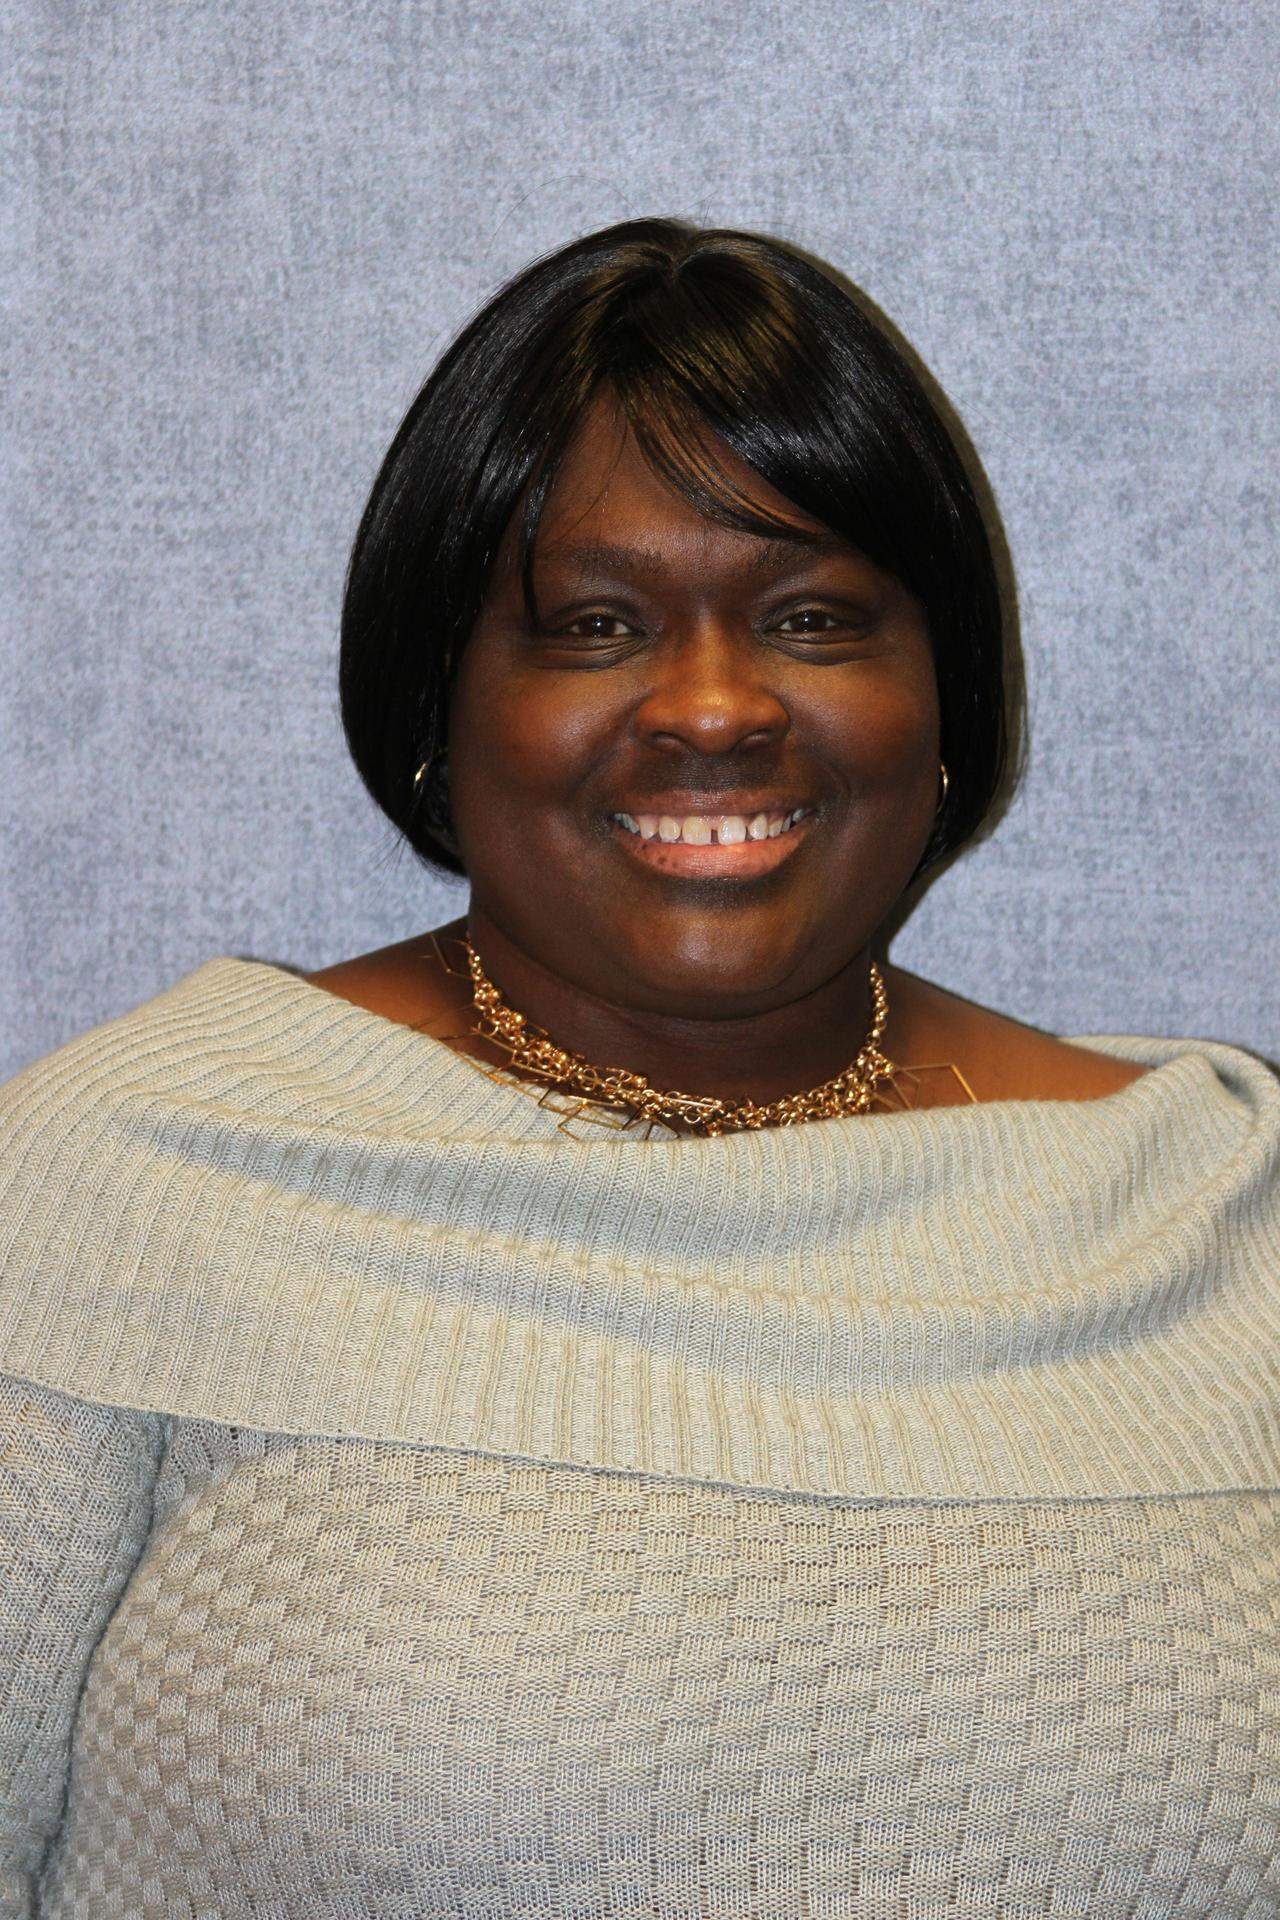 Mrs. Palmer